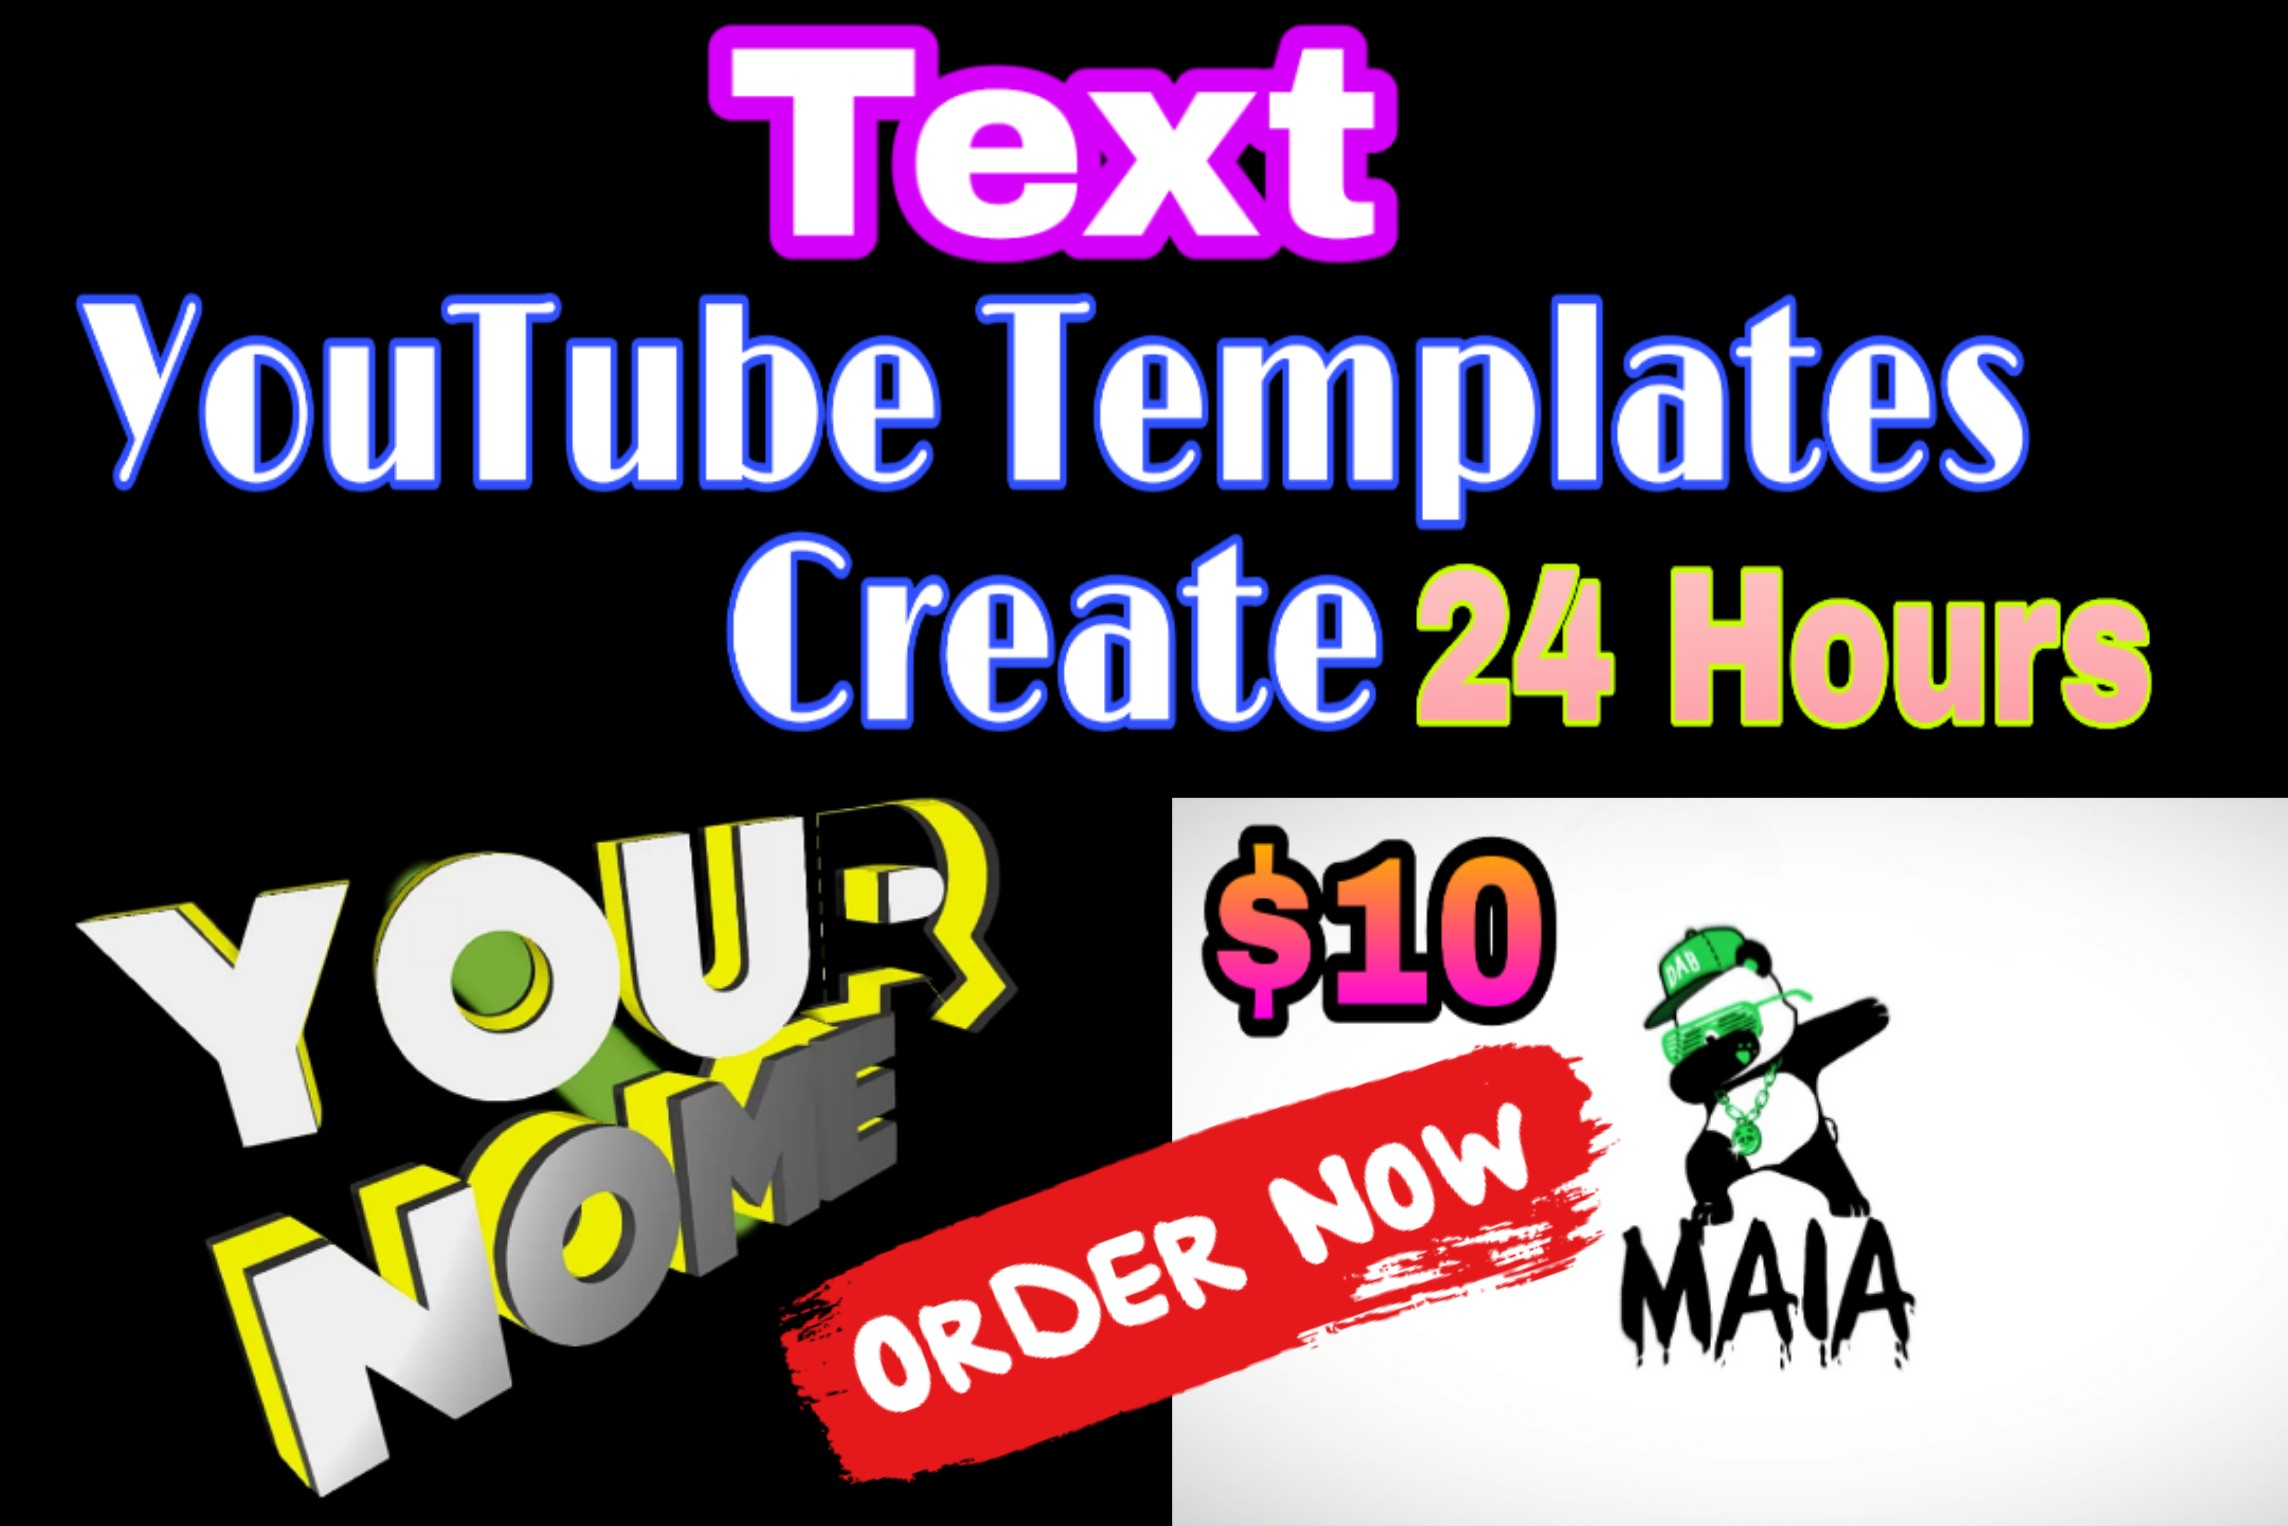 I well do text templates create on youtube